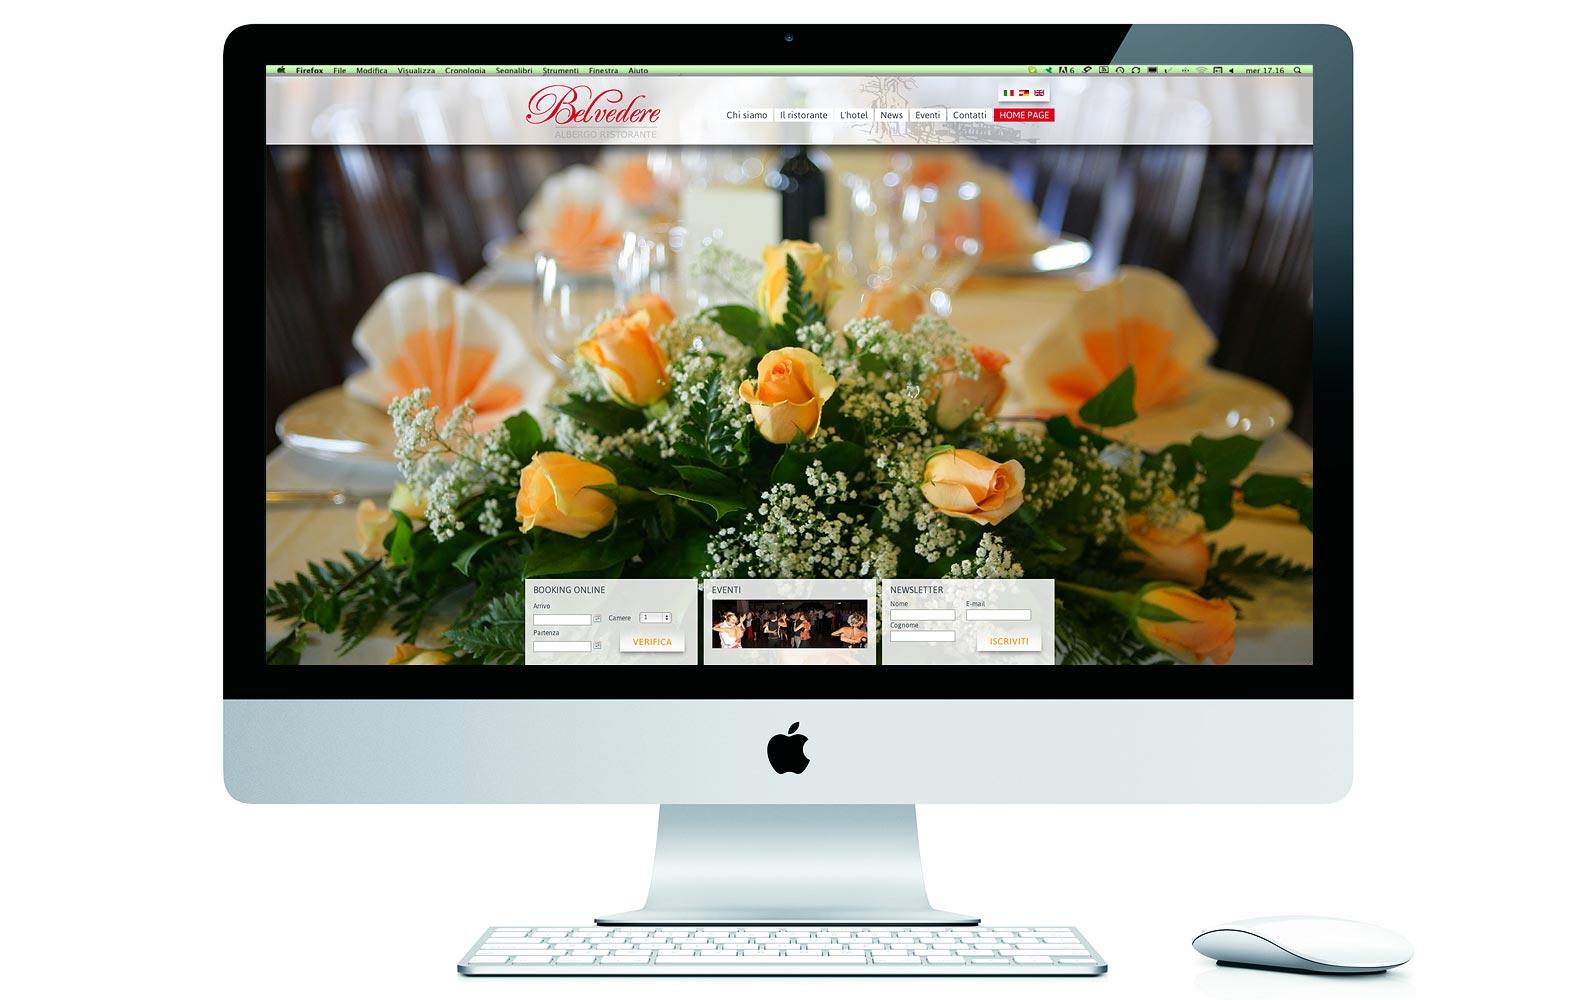 Belvedere iMac_immagine_2000x1260